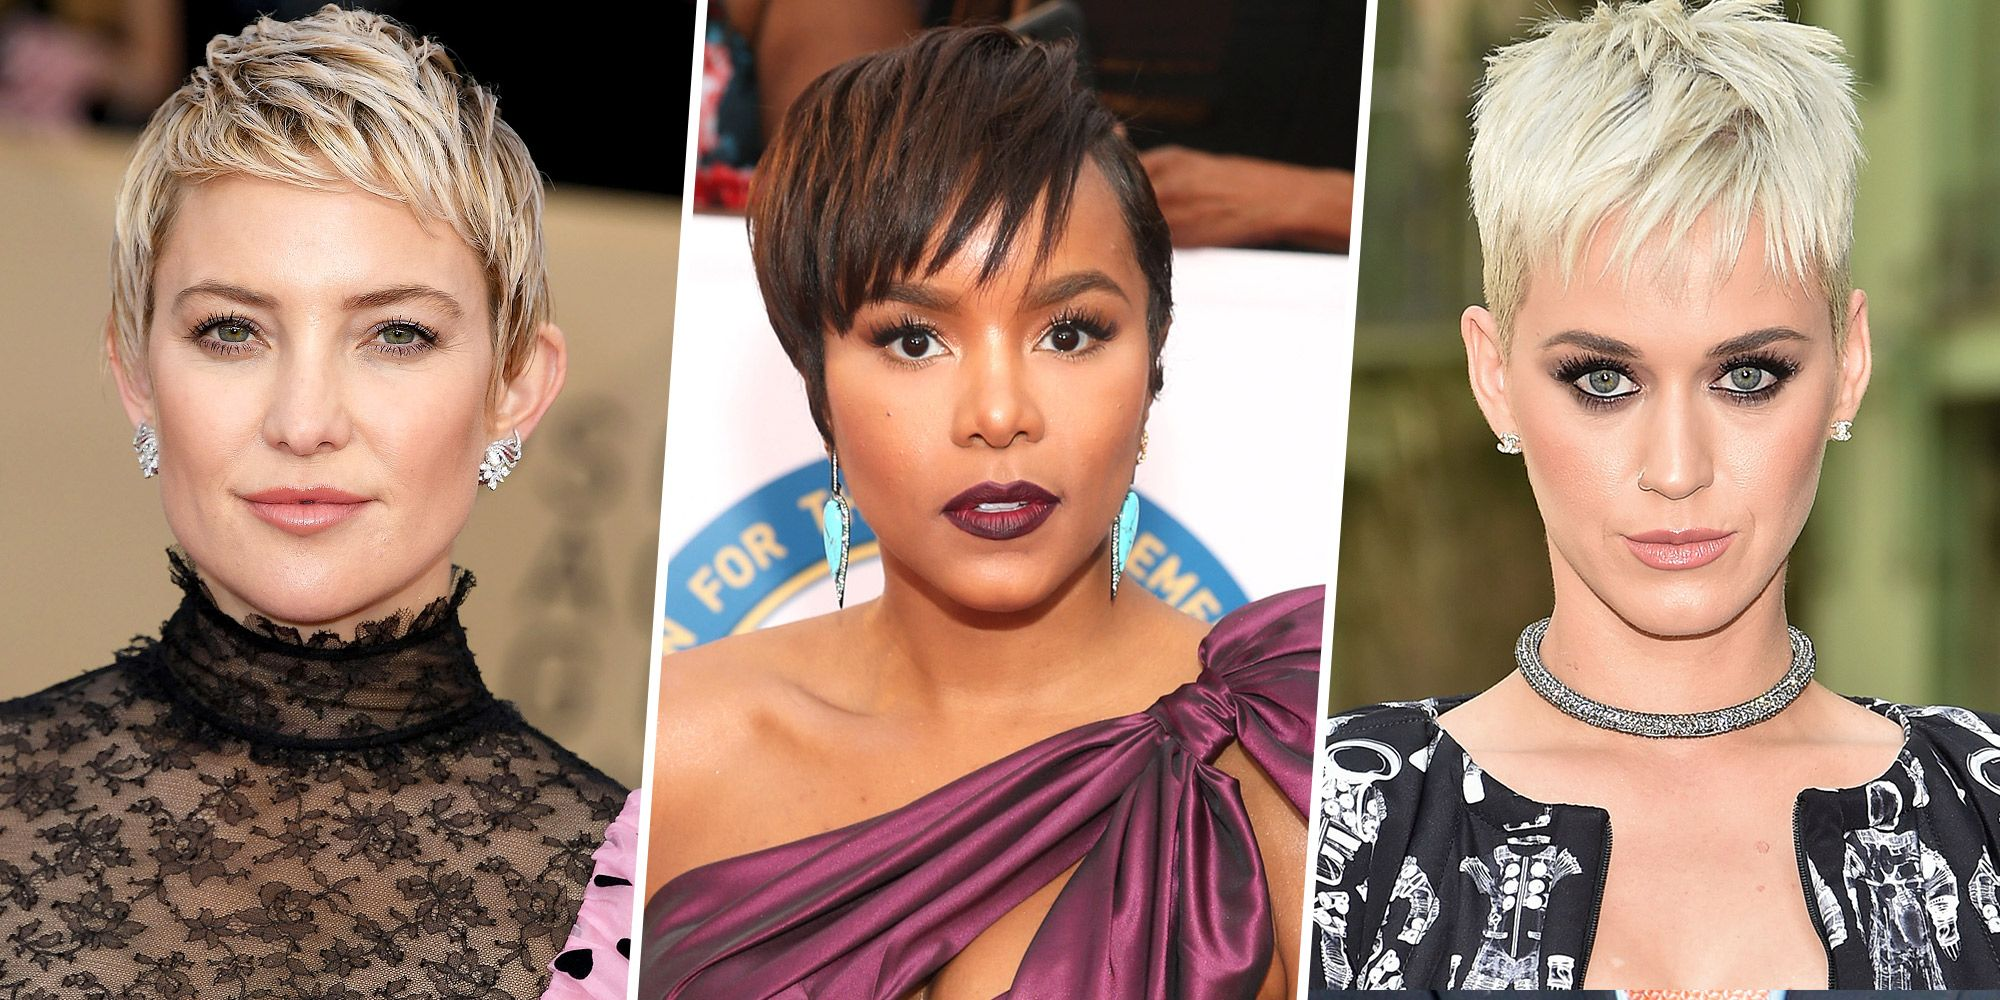 53 Best Pixie Cut Hairstyle Ideas 2018 Cute Celebrity